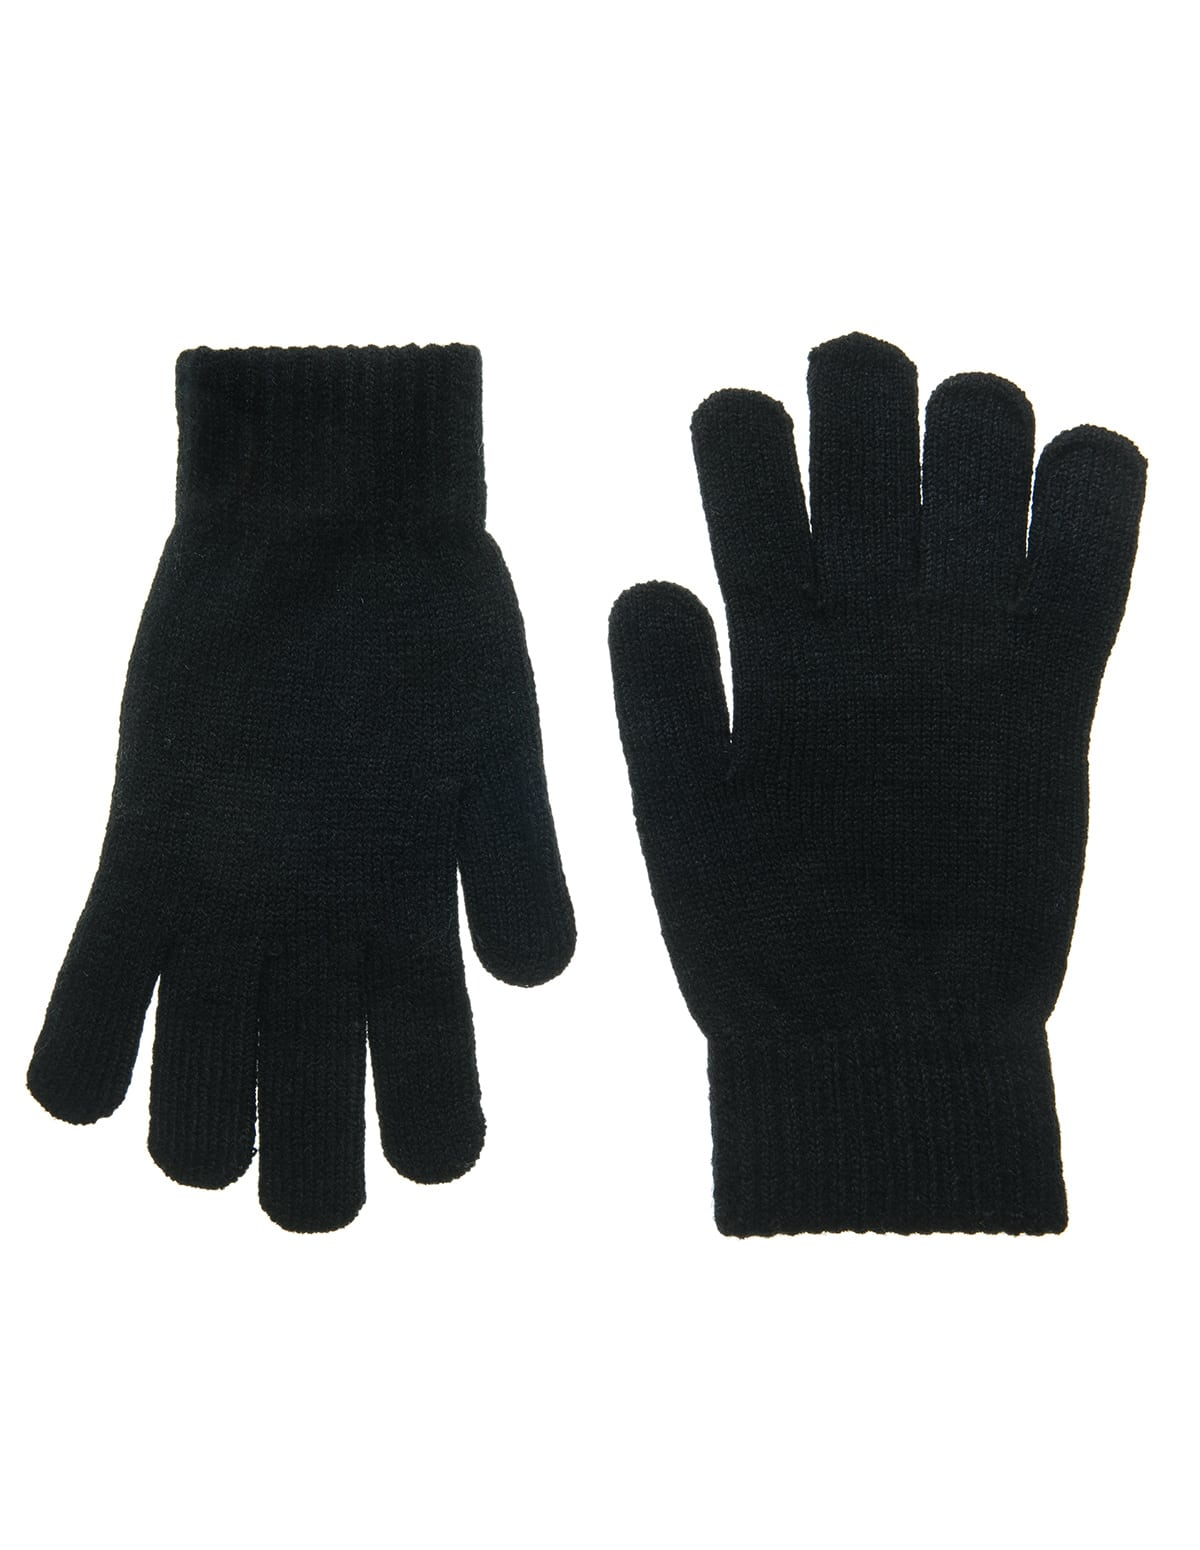 755efa772d Home Αξεσουάρ Γυναικεία αξεσουάρ Γάντια μάλλινα σε μαύρο χρώμα